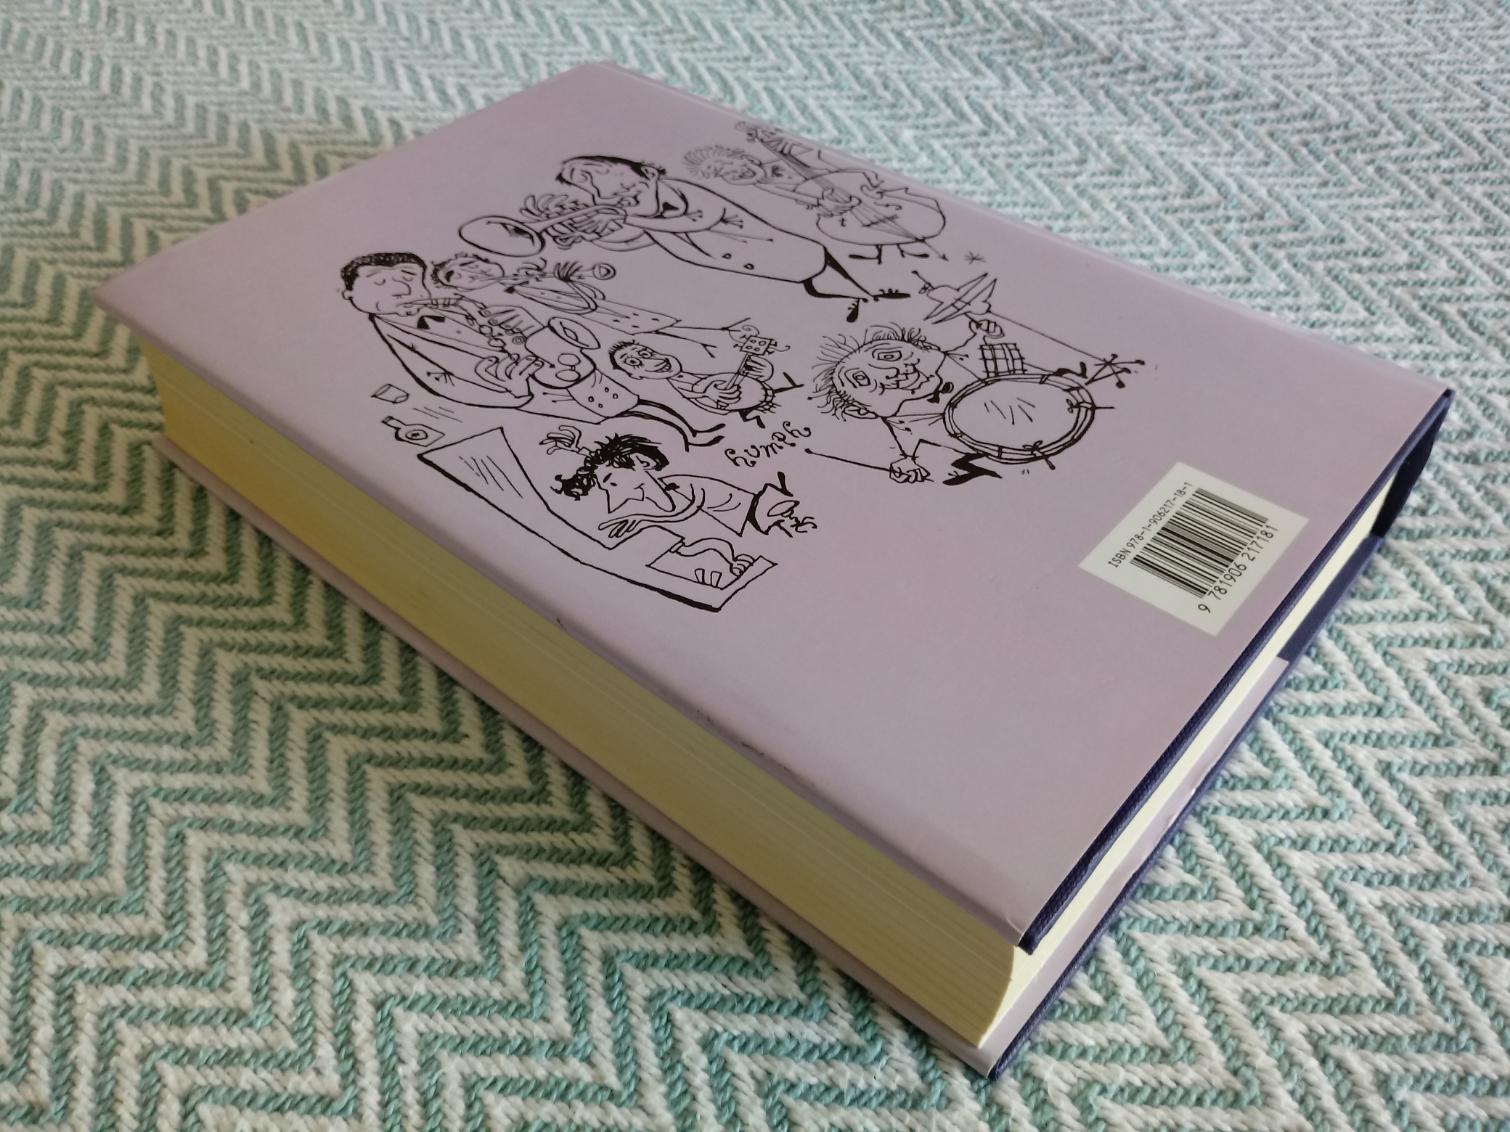 Humphrey Lyttleton Last Chorus An Autobiographical Medley hardback book 447 pages Published 2008 J.